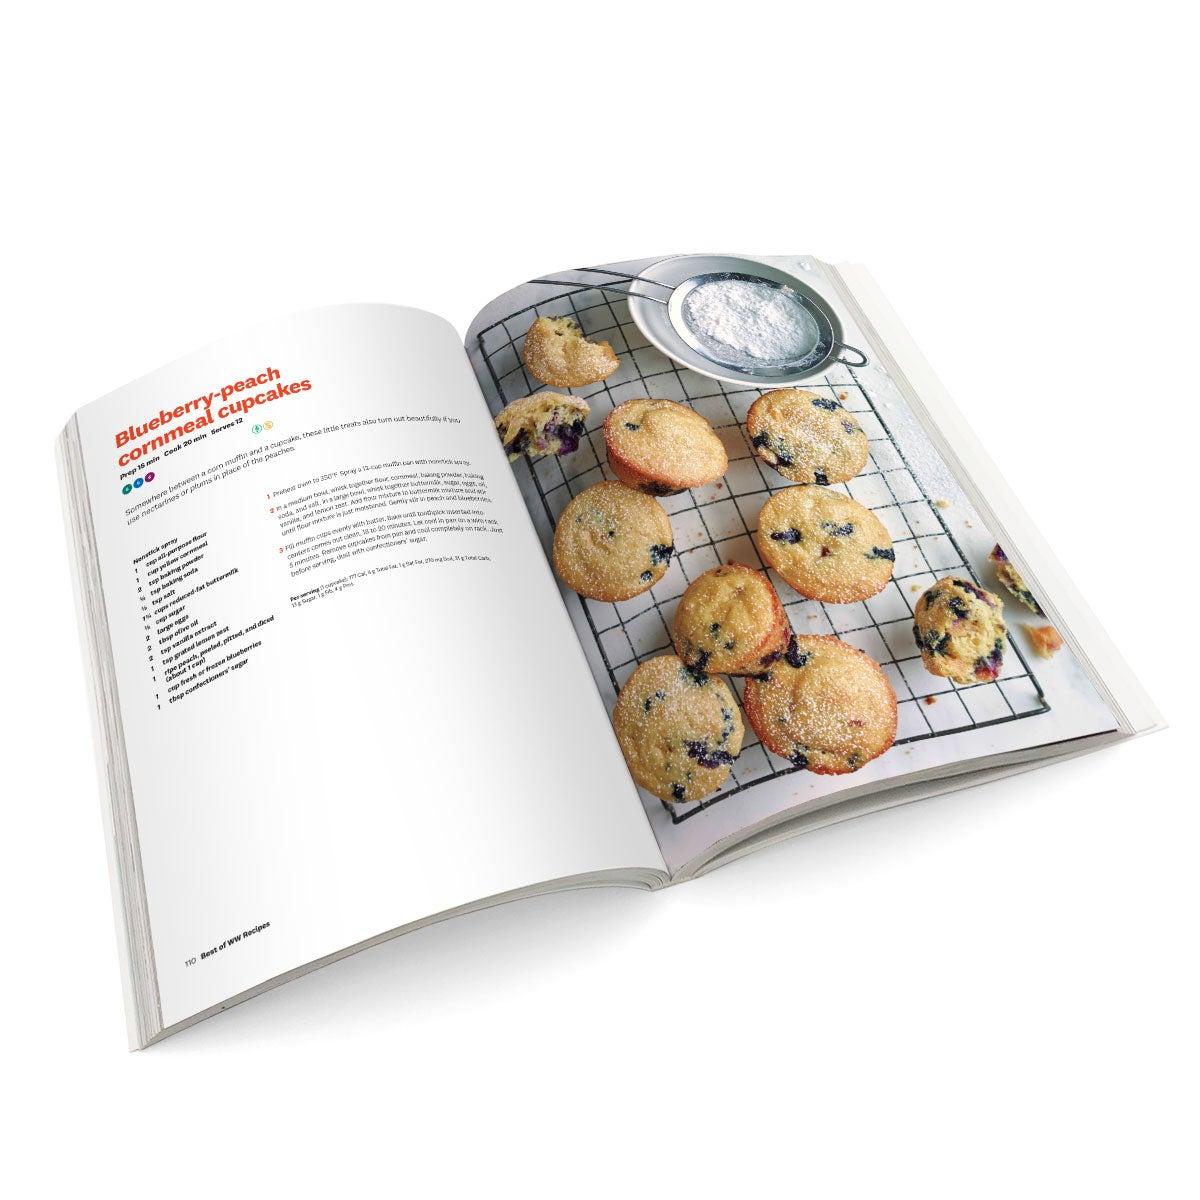 Best of WW Recipes Cookbook - Open Spread 2